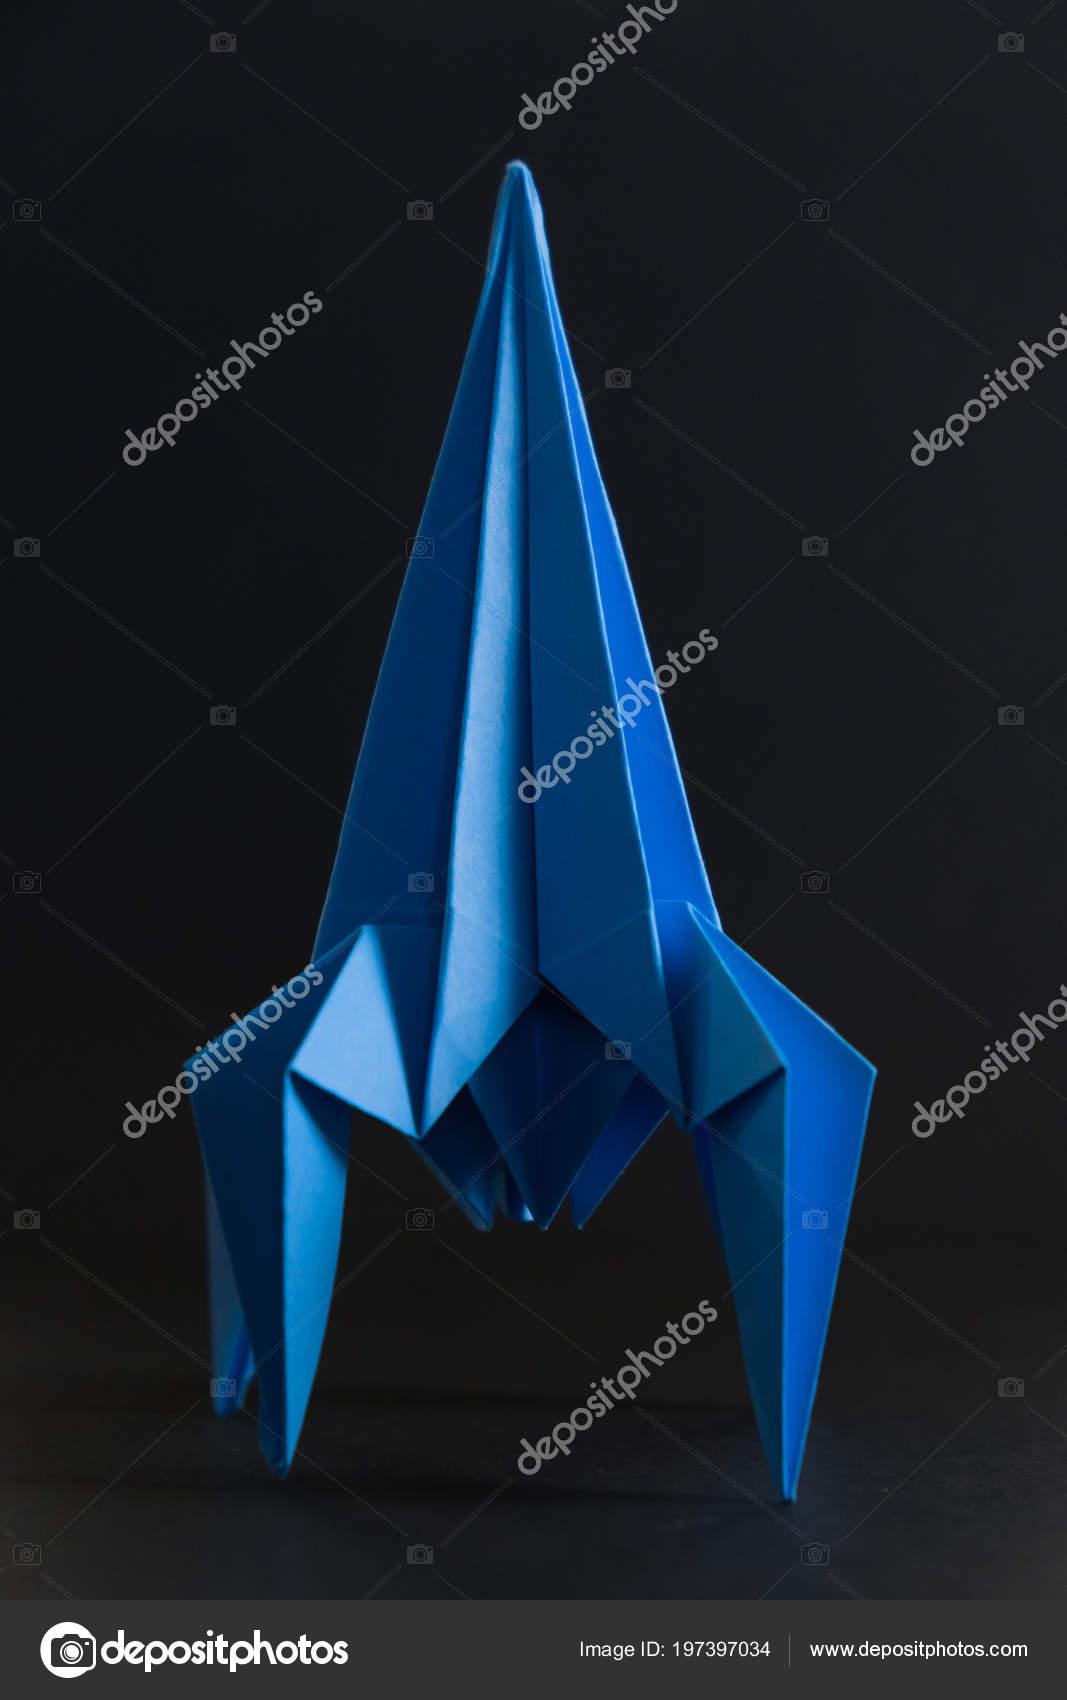 Paper Homemade Origami Rocket Craft Work Children Stock Photo